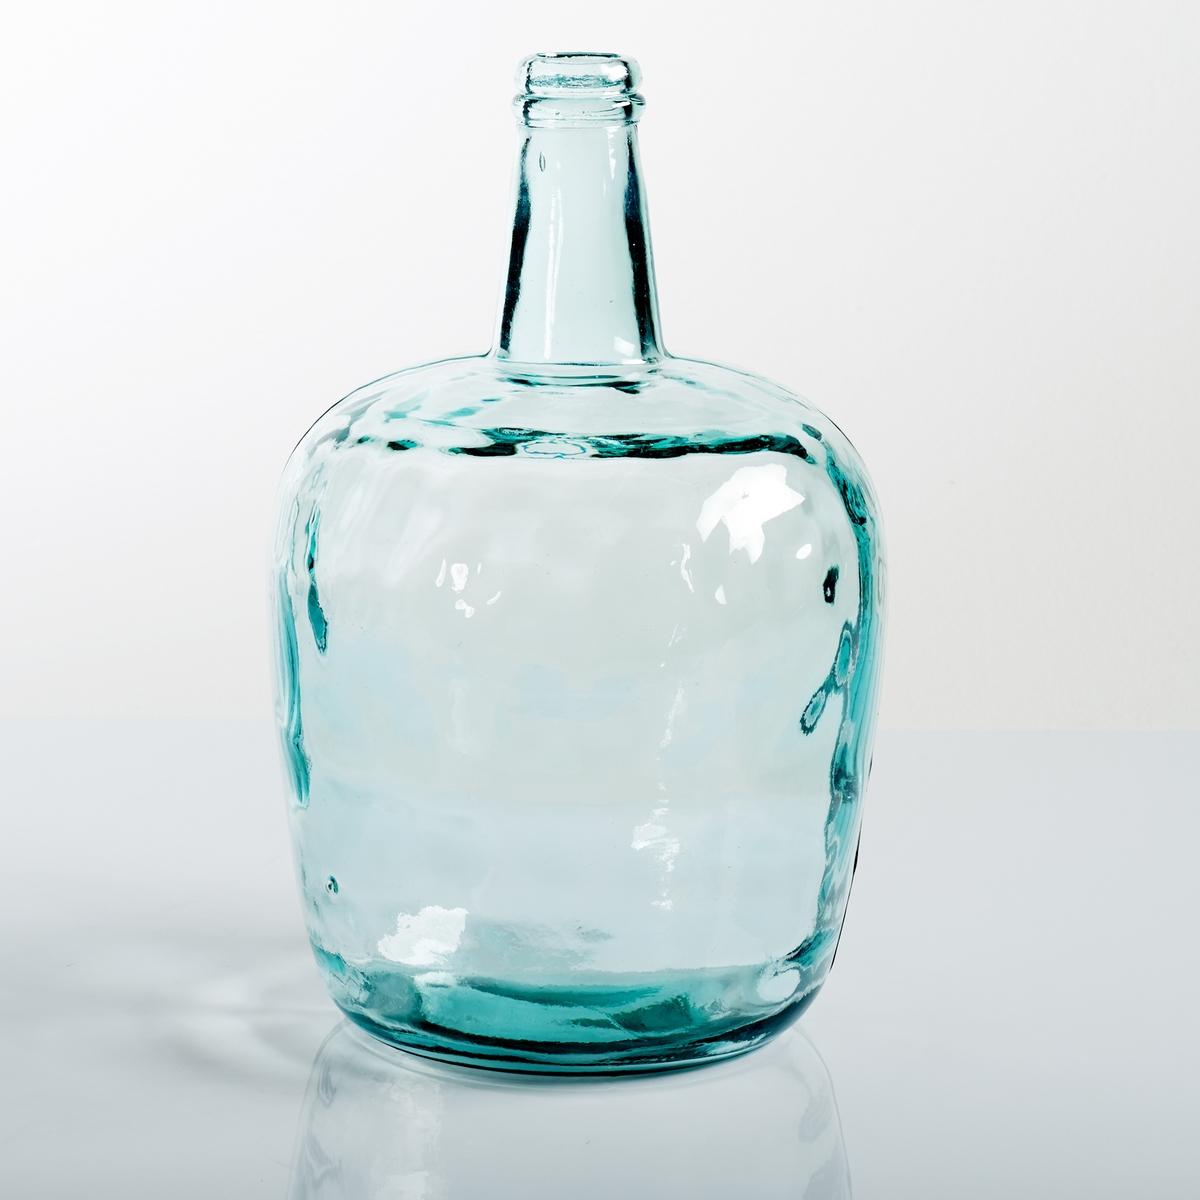 Ваза-бутыль стеклянная, Izolia